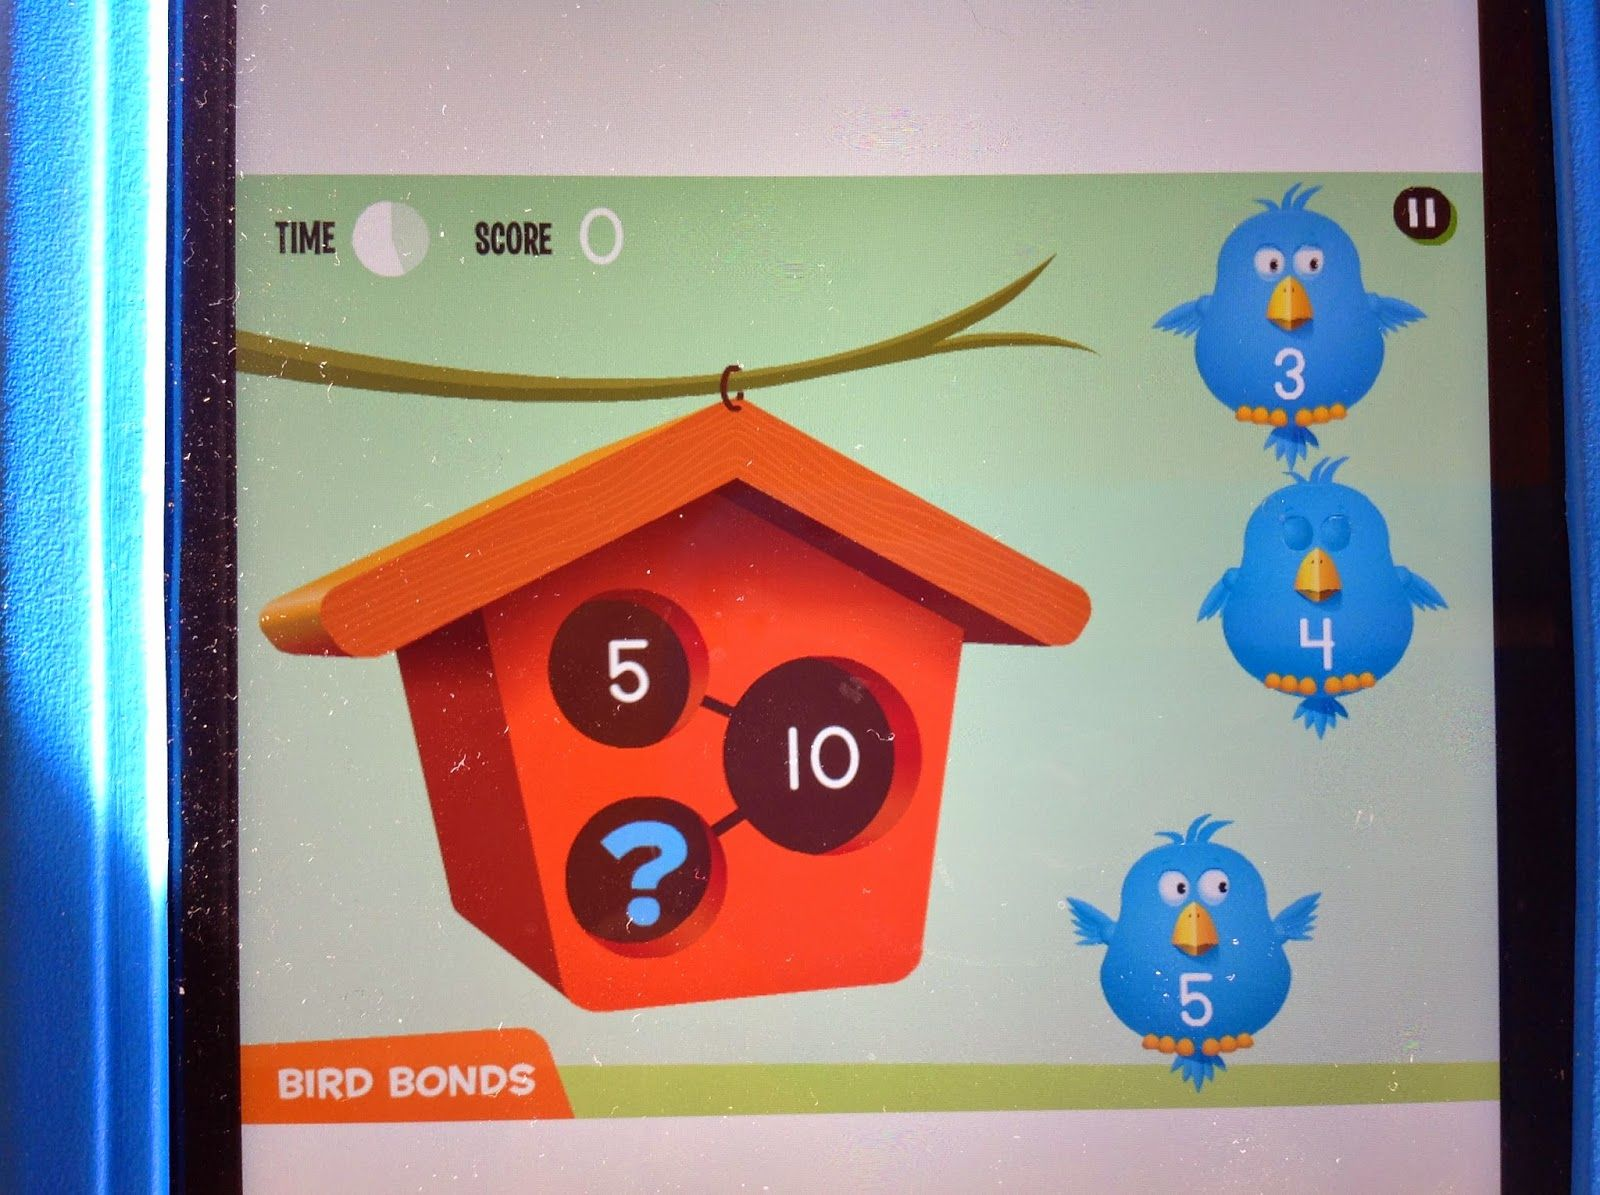 Number Bonds On The Ipad